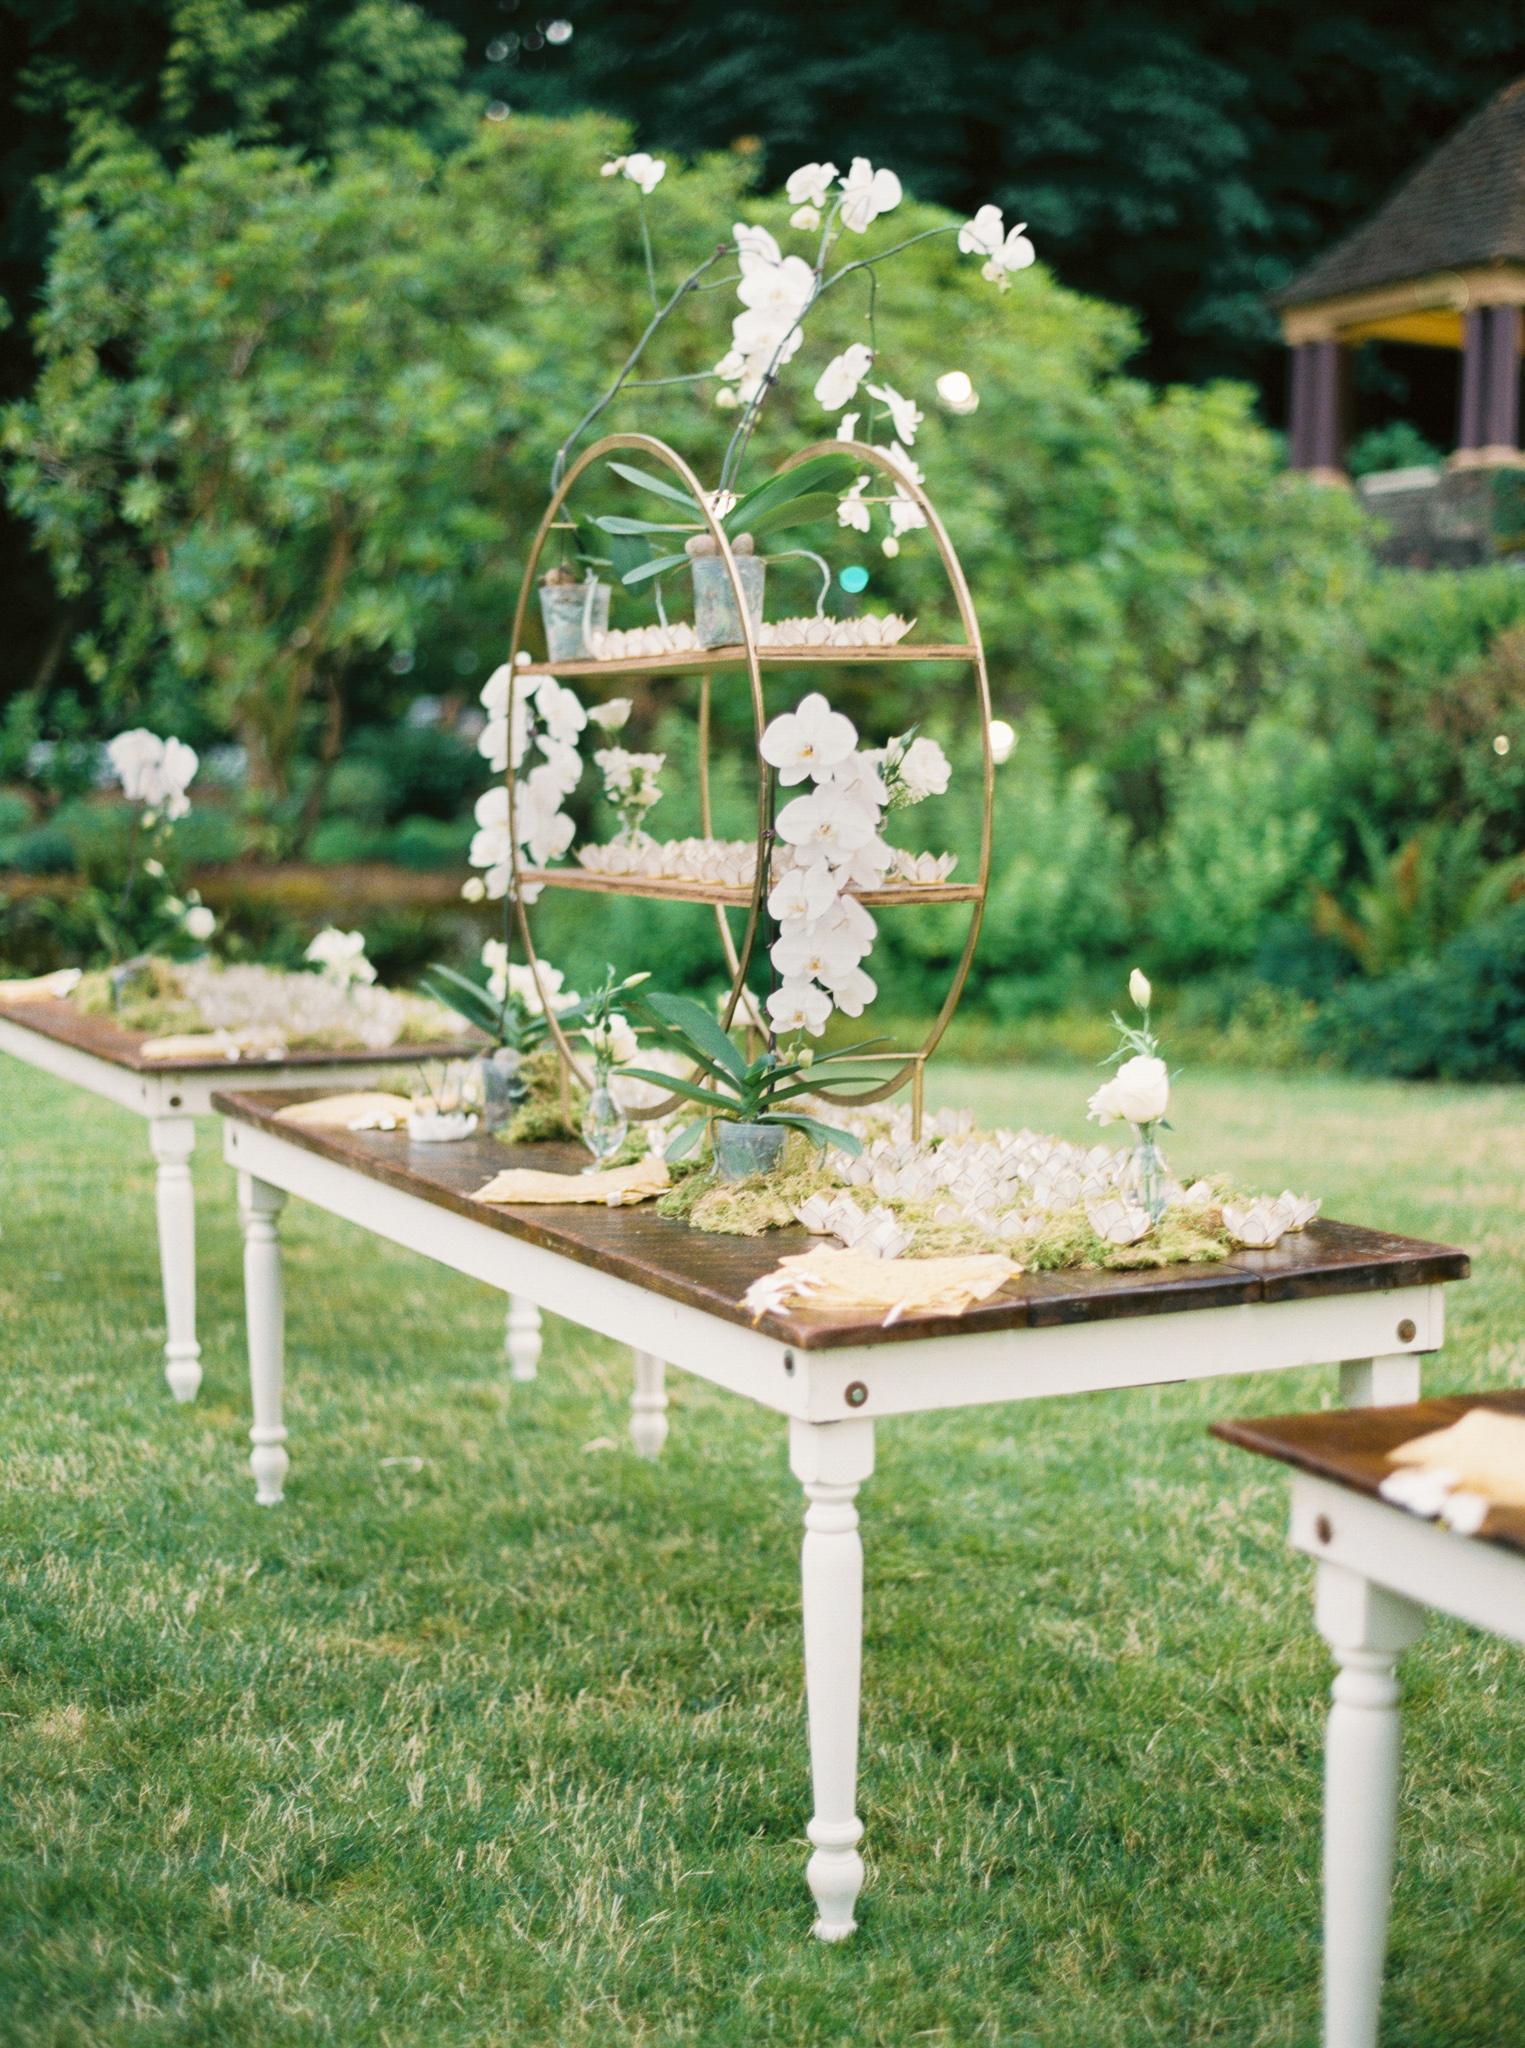 186OutliveCreative_Travel_Photographer_Videographer_Lewis&Clark_Oregon_Elegant_BlackTie_Destination_Wedding.jpg